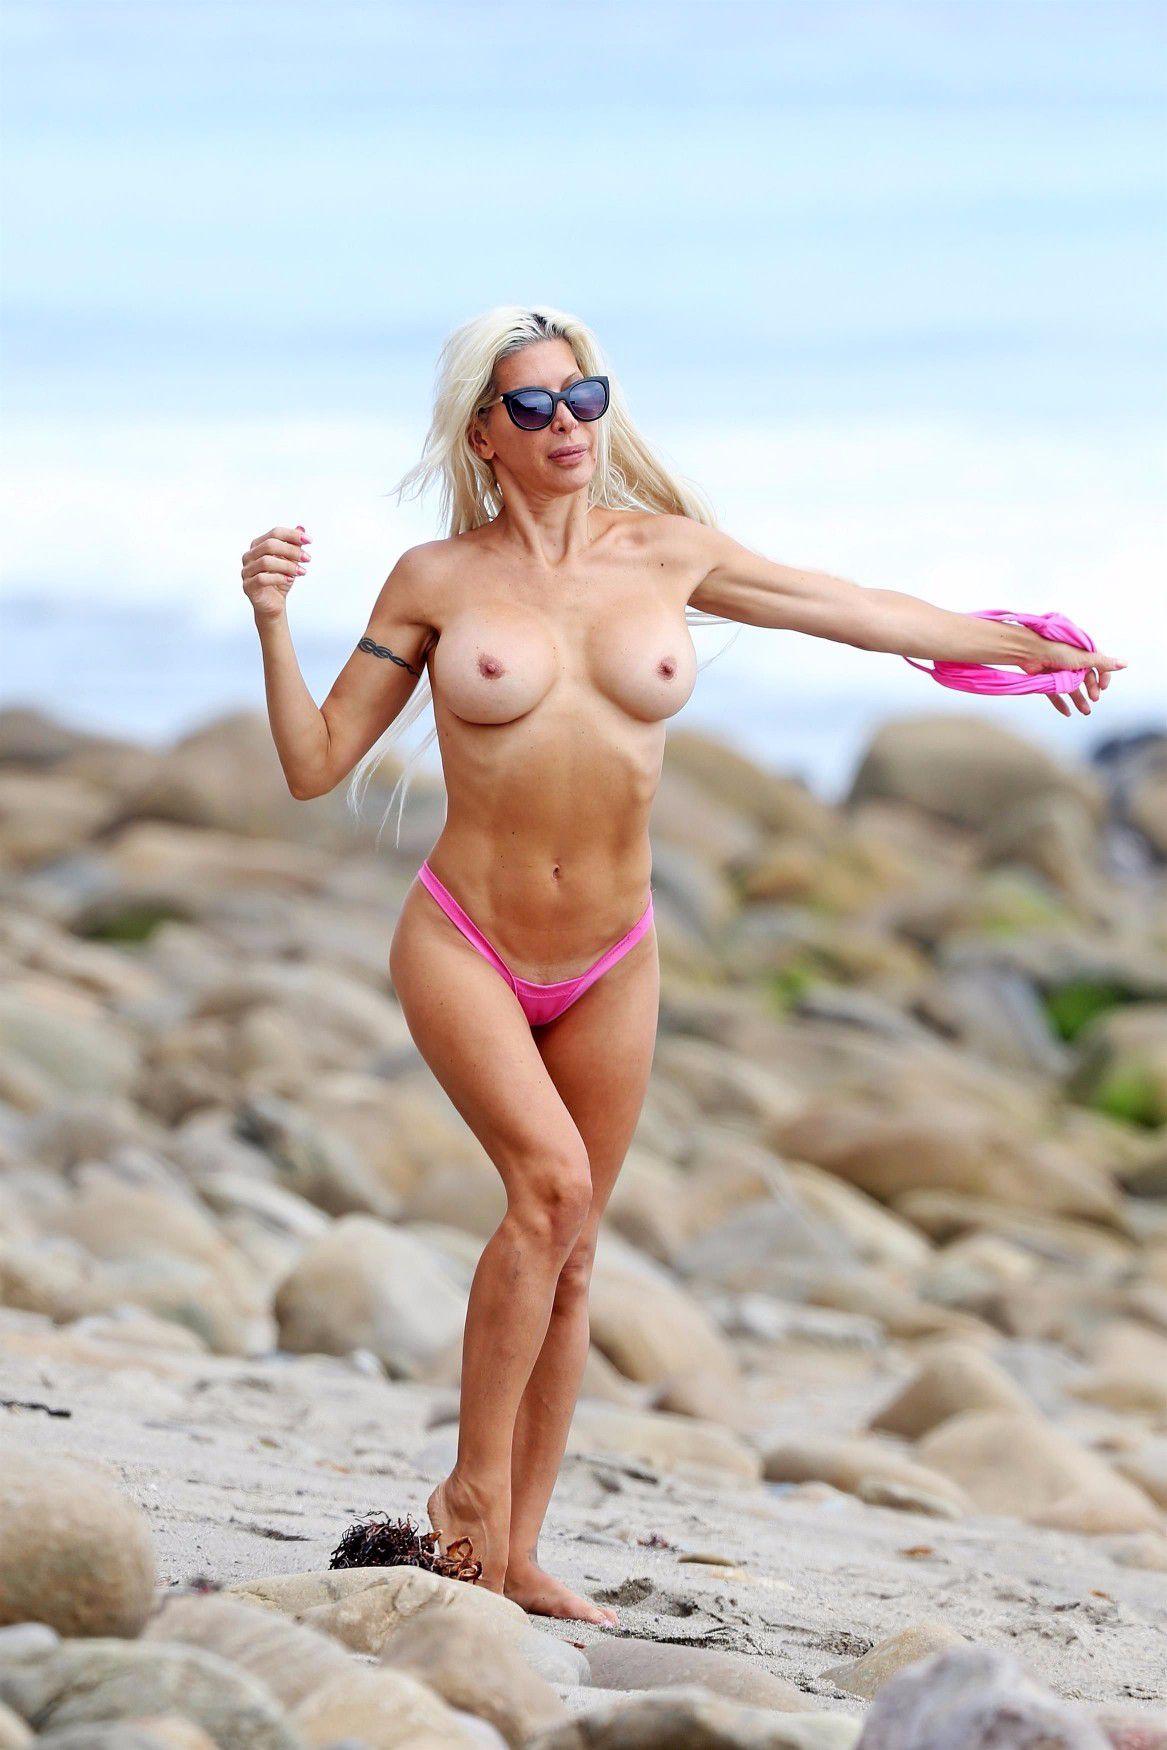 Brooke elliott naked